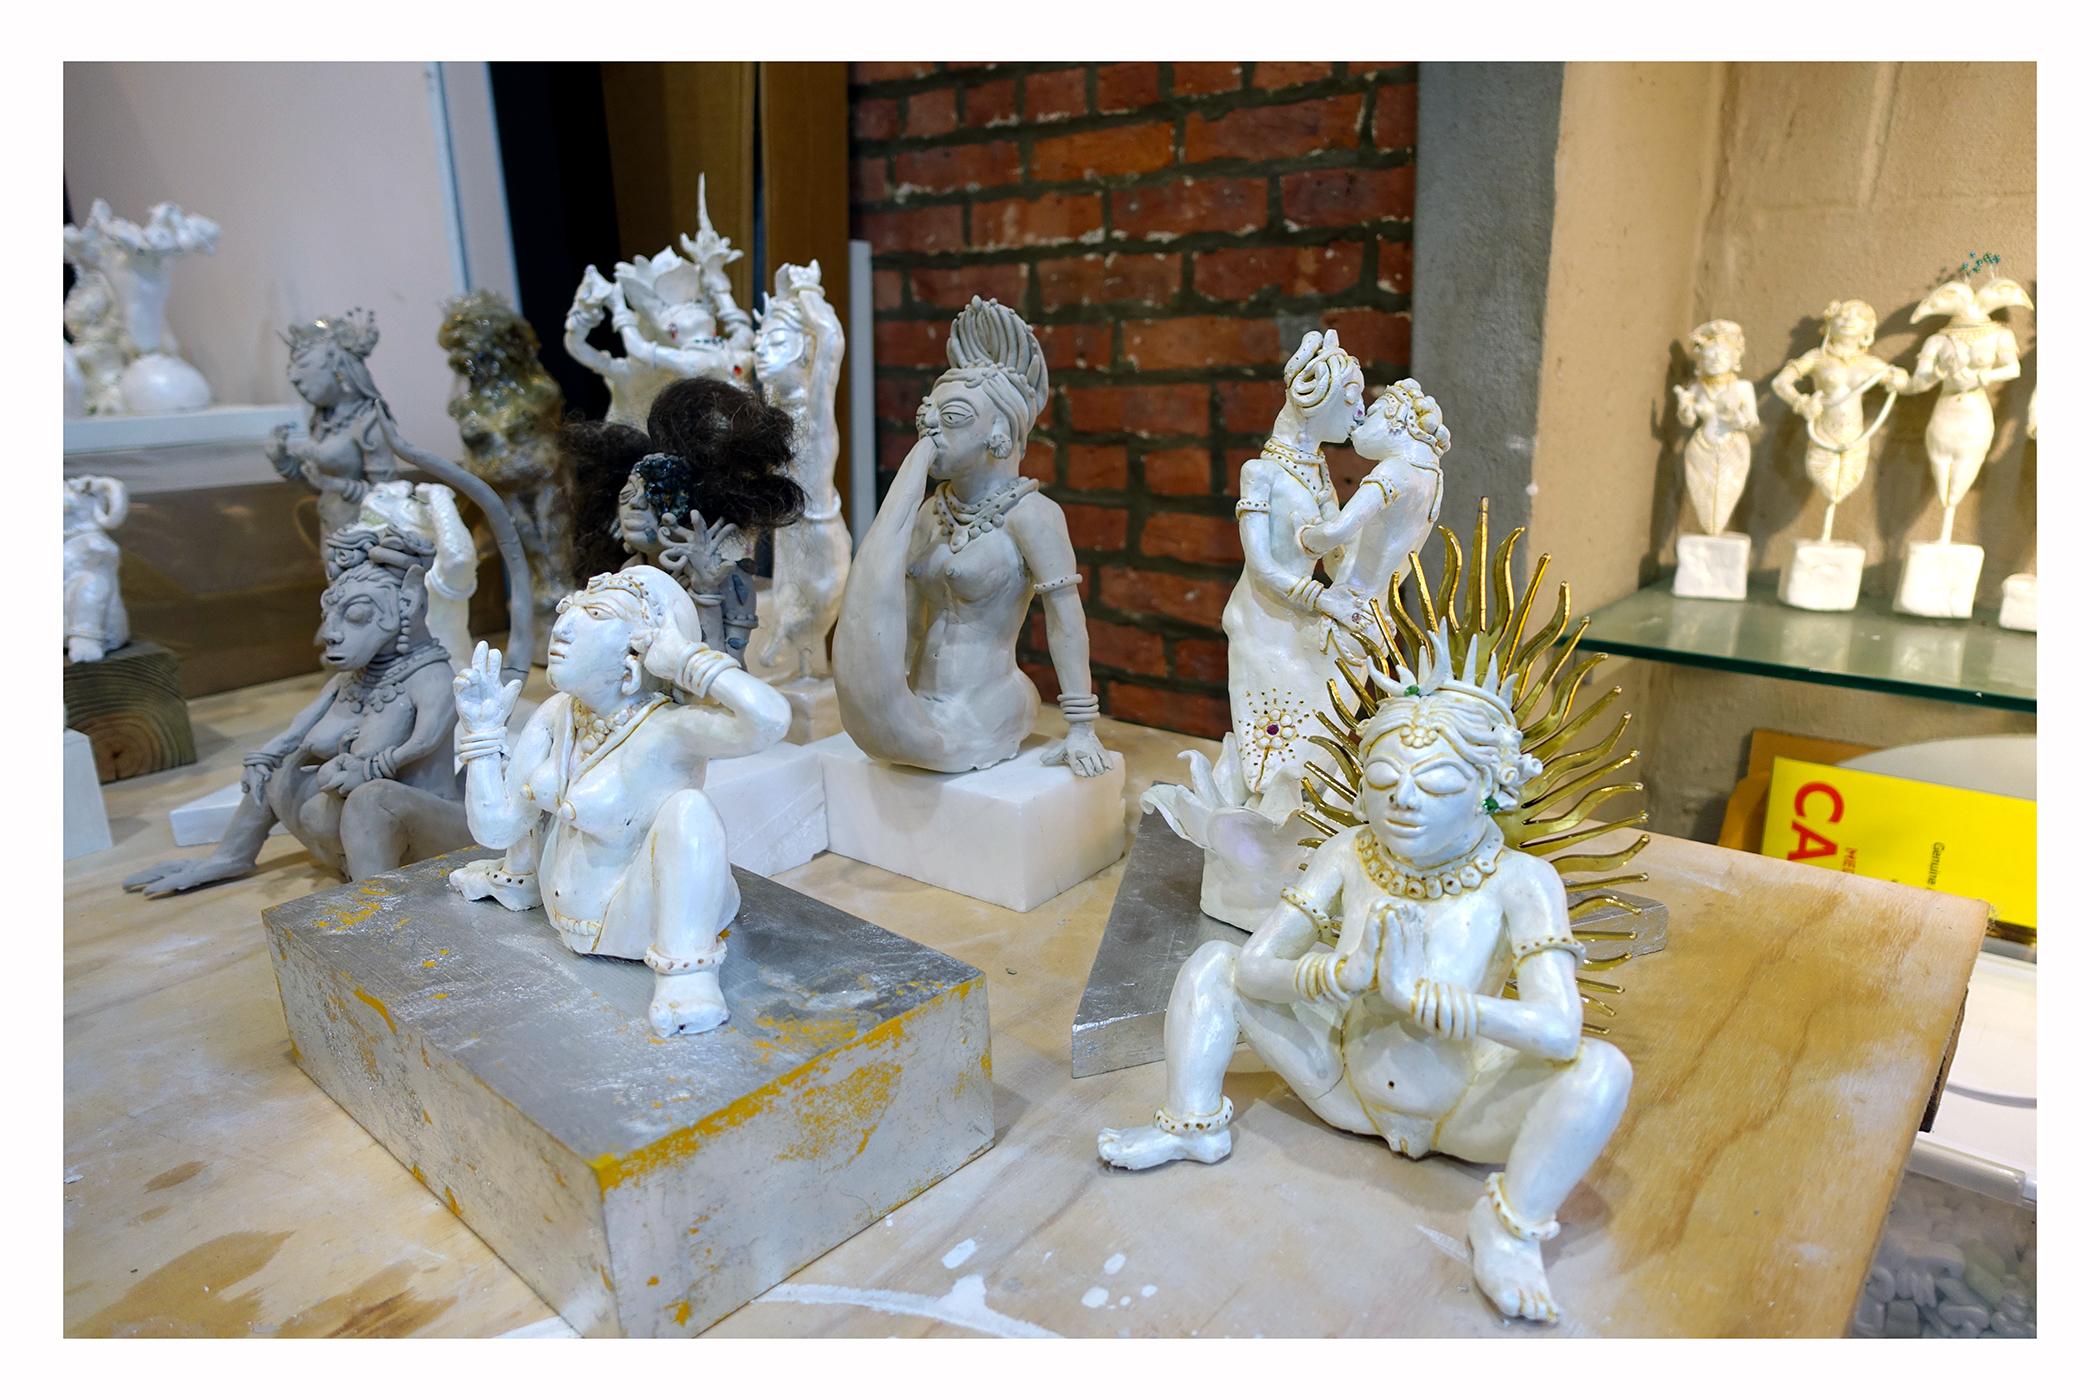 Auto biographical squatting goddesses that transcend roles and original intent